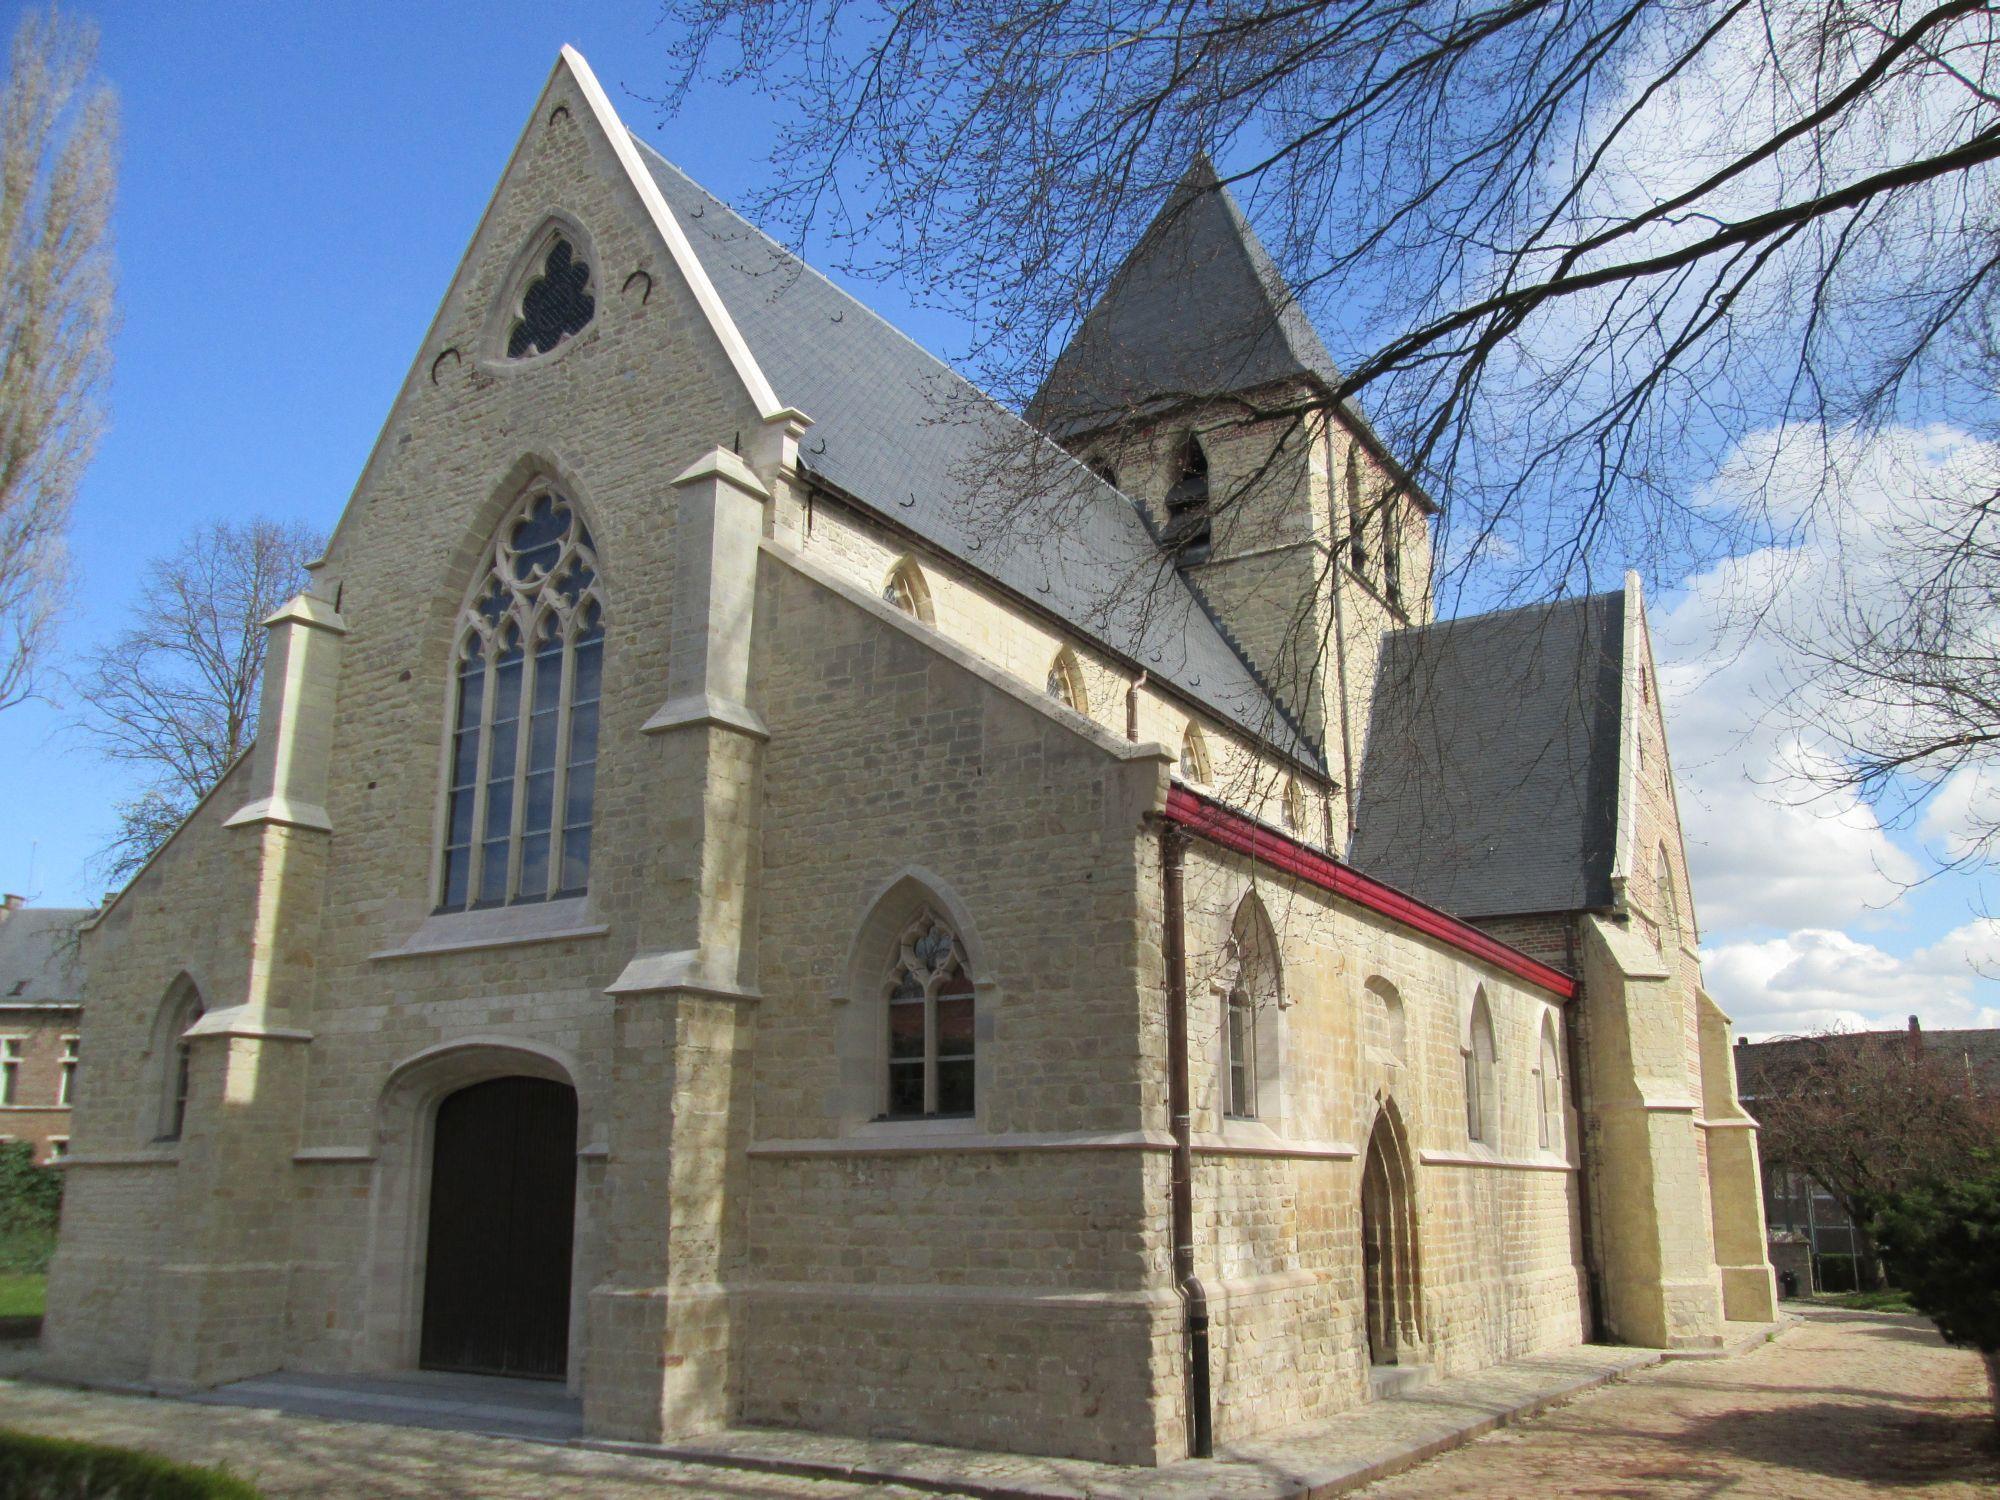 De Sint-Niklaaskerk van Drogenbos